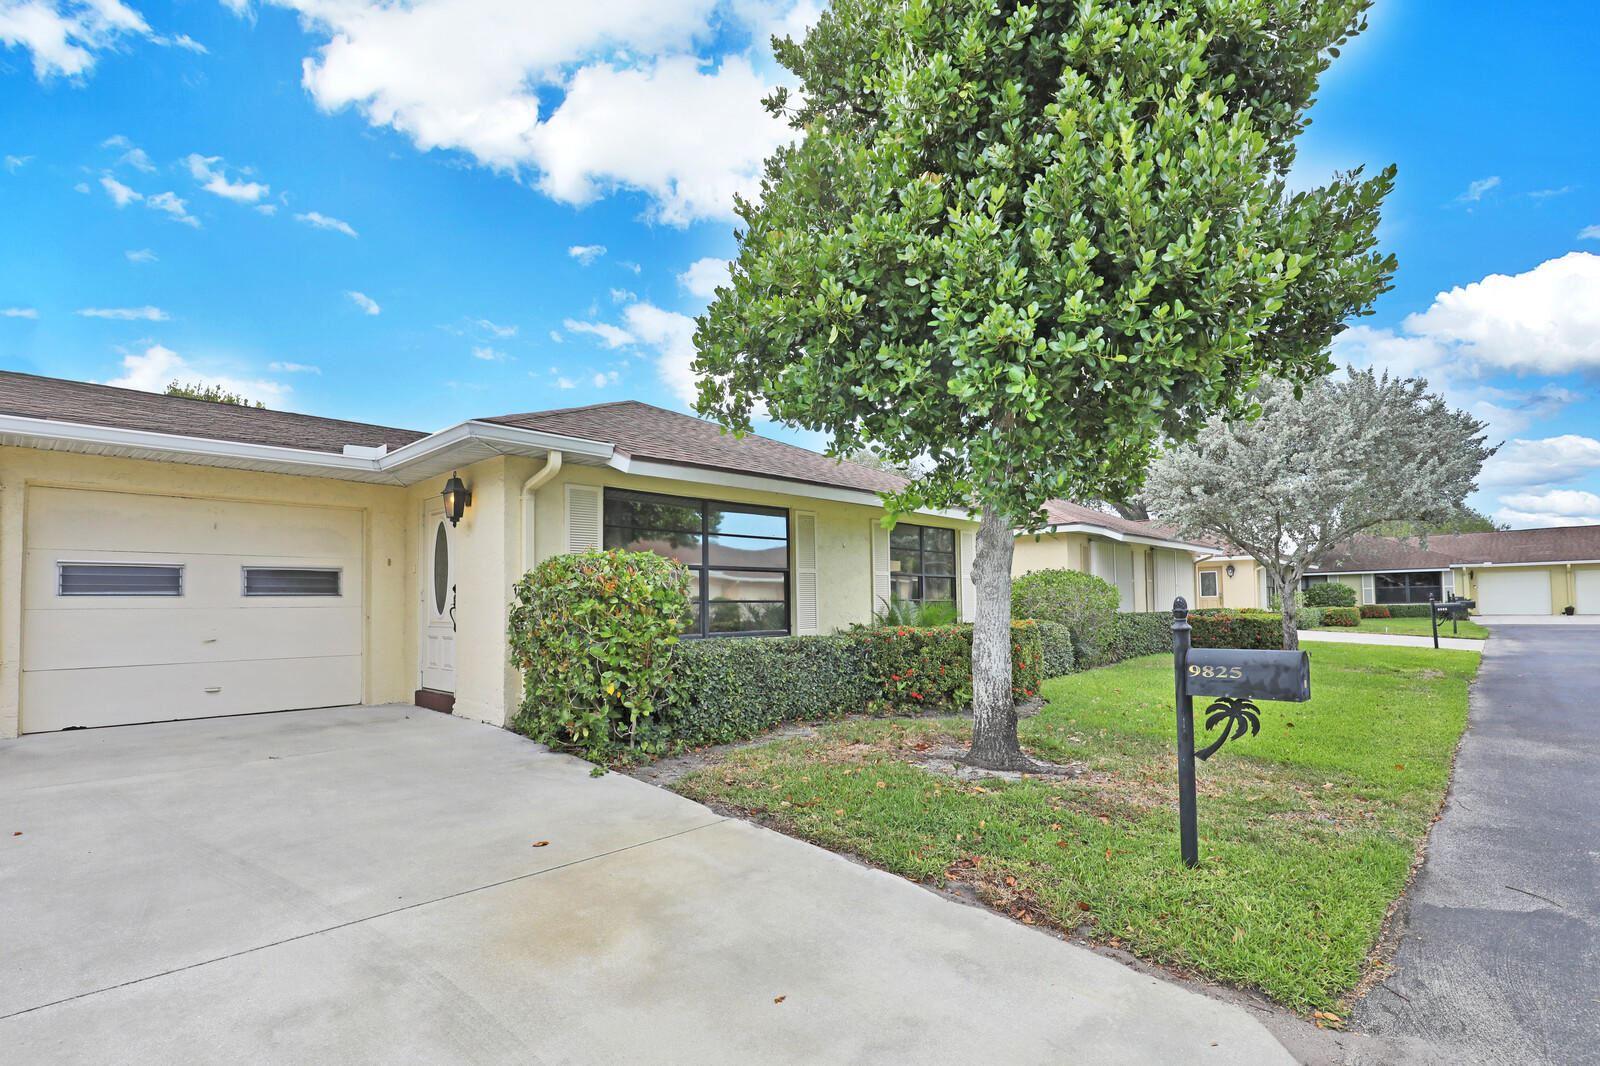 9825 Walnut Tree Way #B, Boynton Beach, FL 33436 - MLS#: RX-10714143